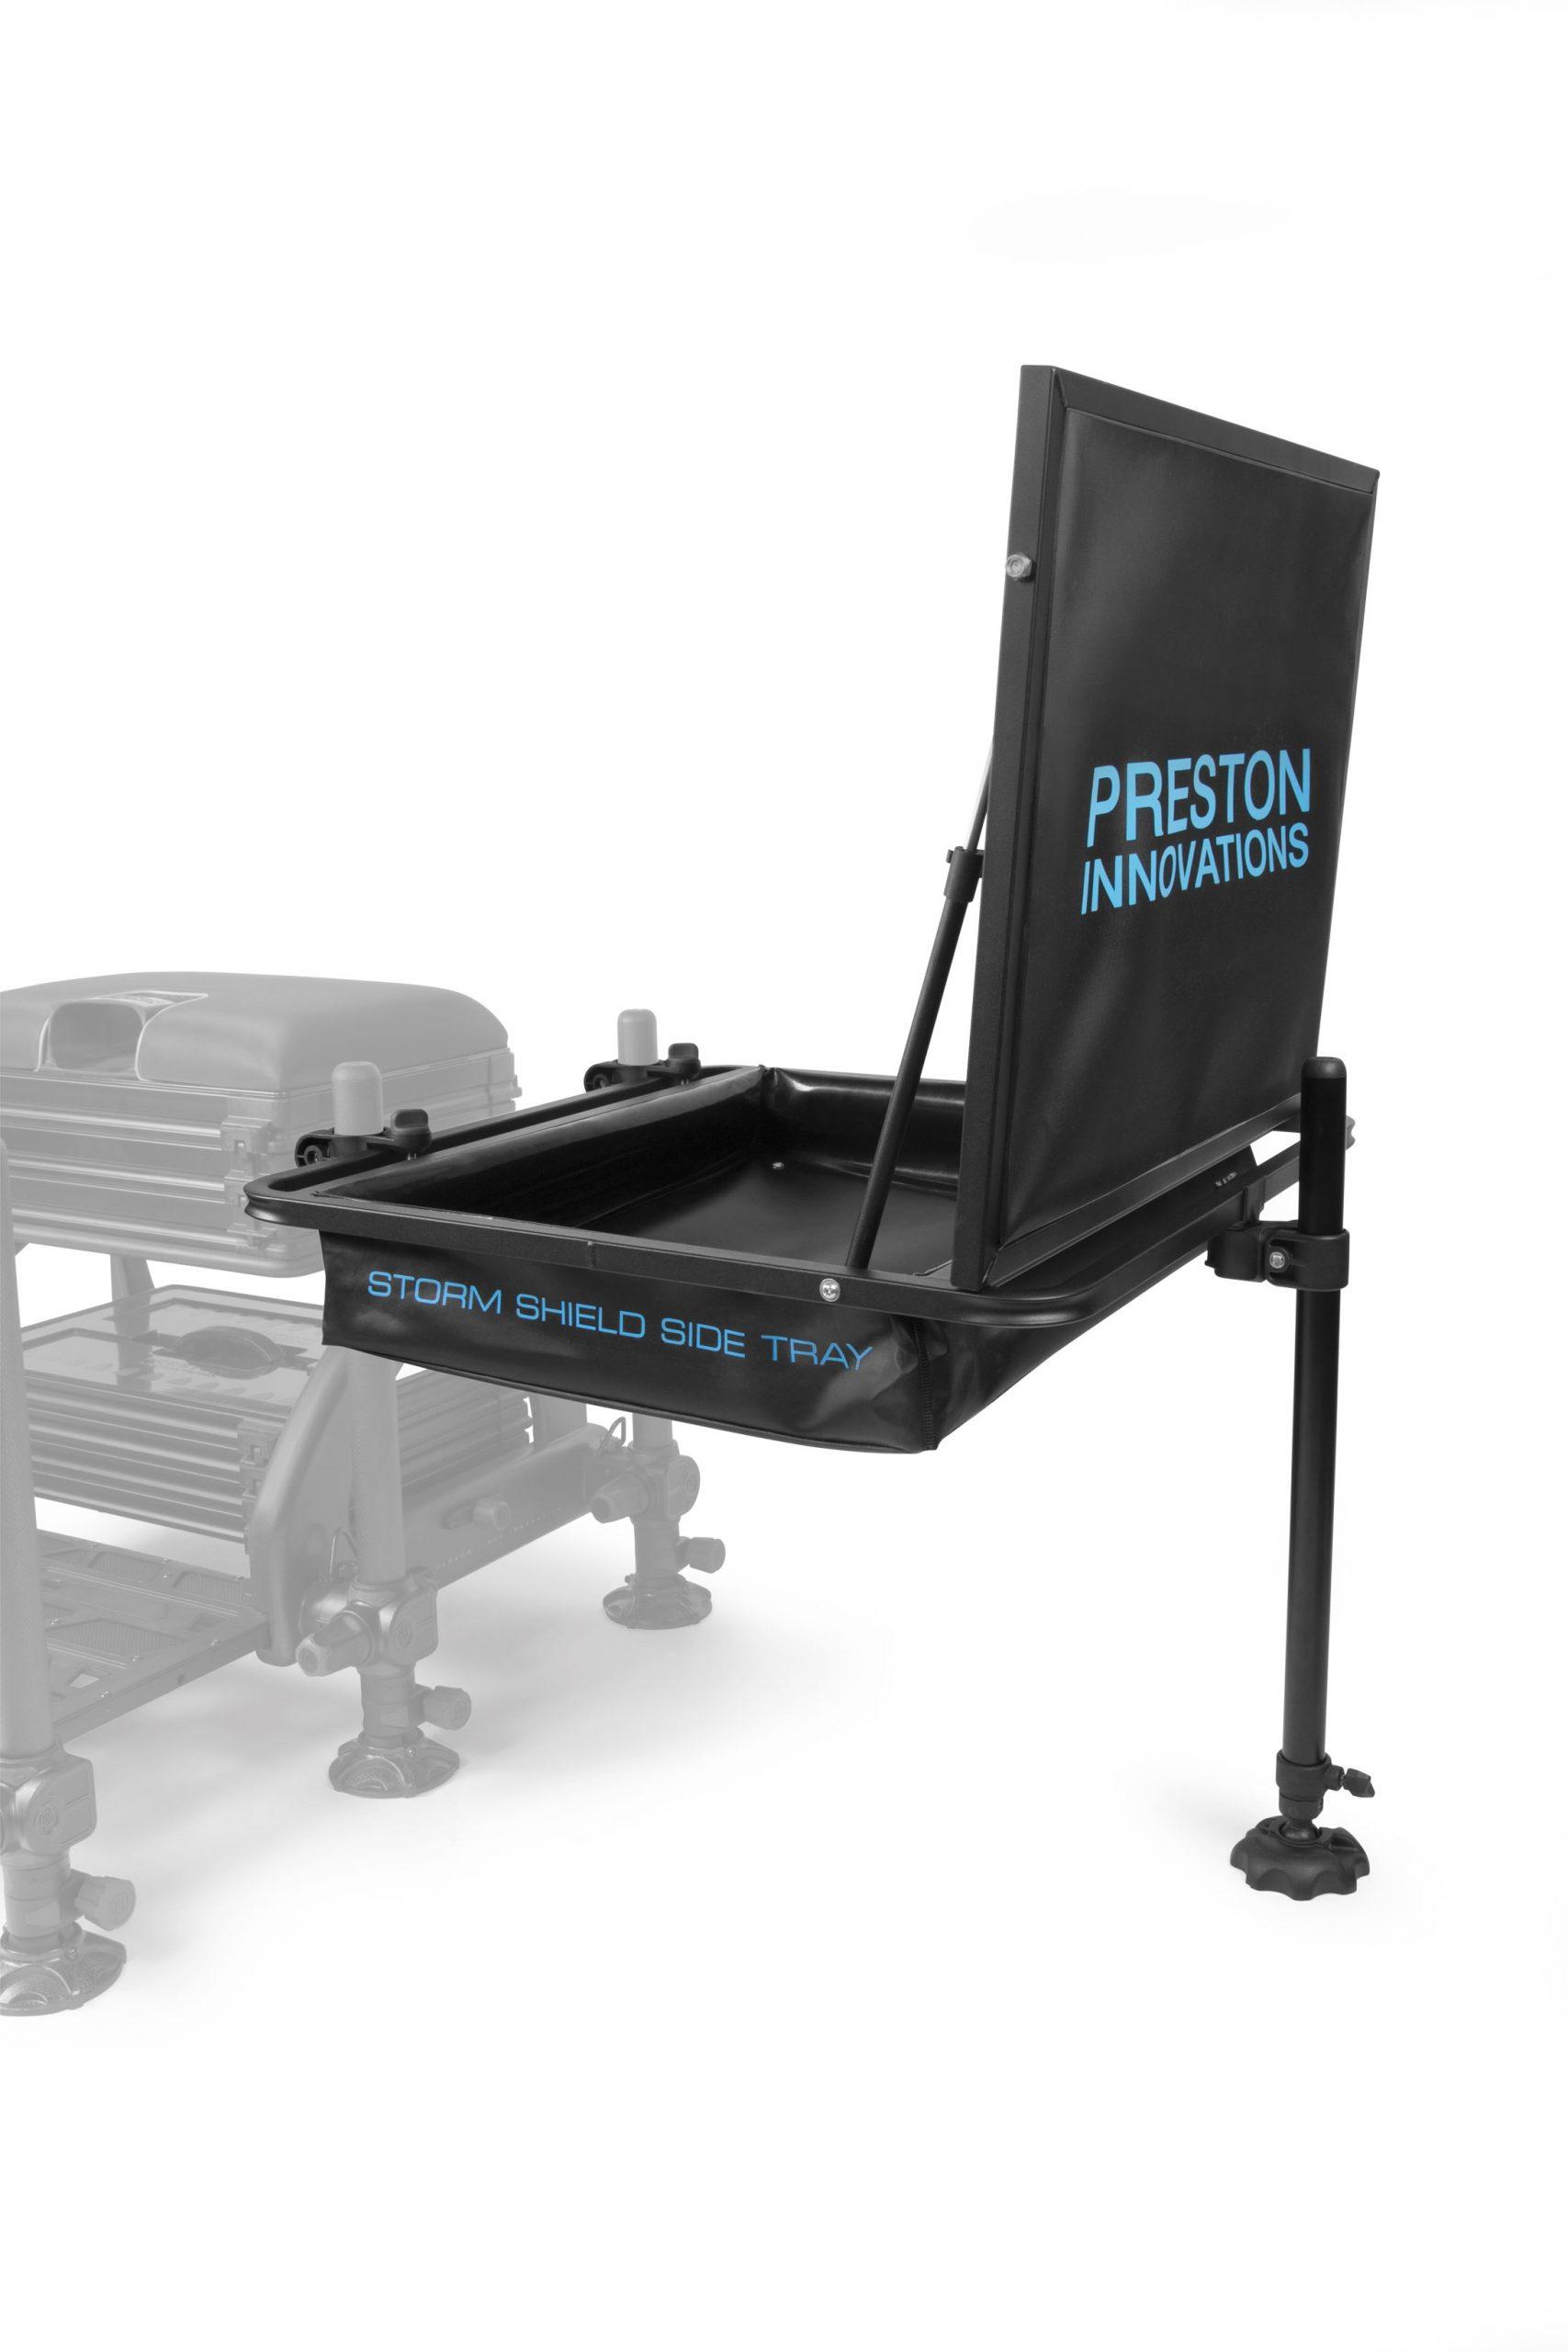 Preston Stormshield side tray